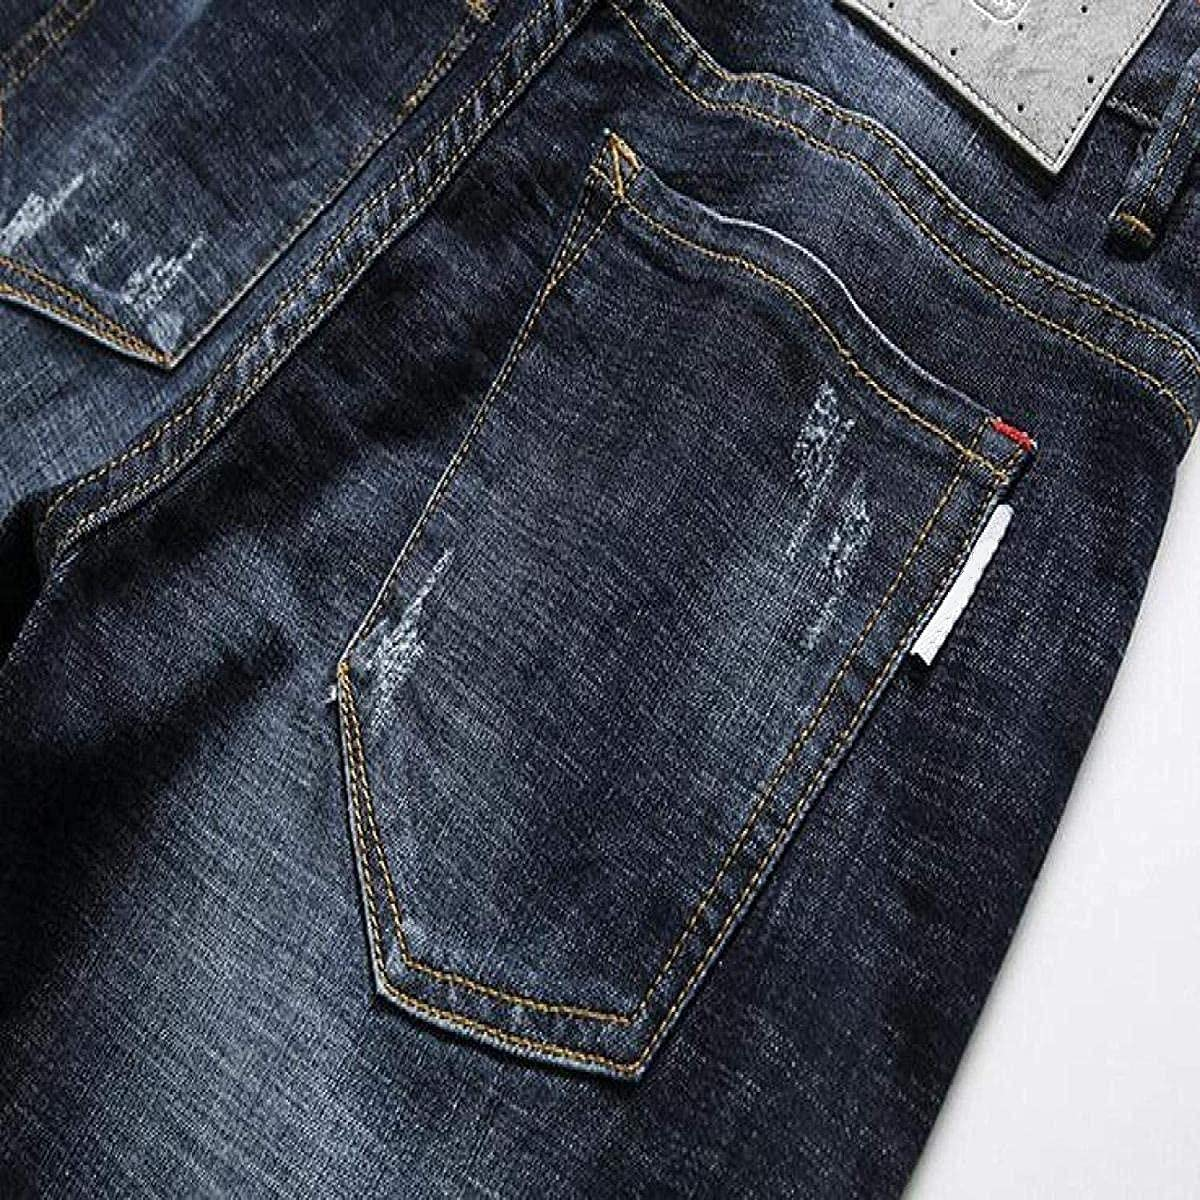 Men's Ripped Denim Shorts Mid-Waist Stretch Slim-fit Classic Five-Pocket Zipper